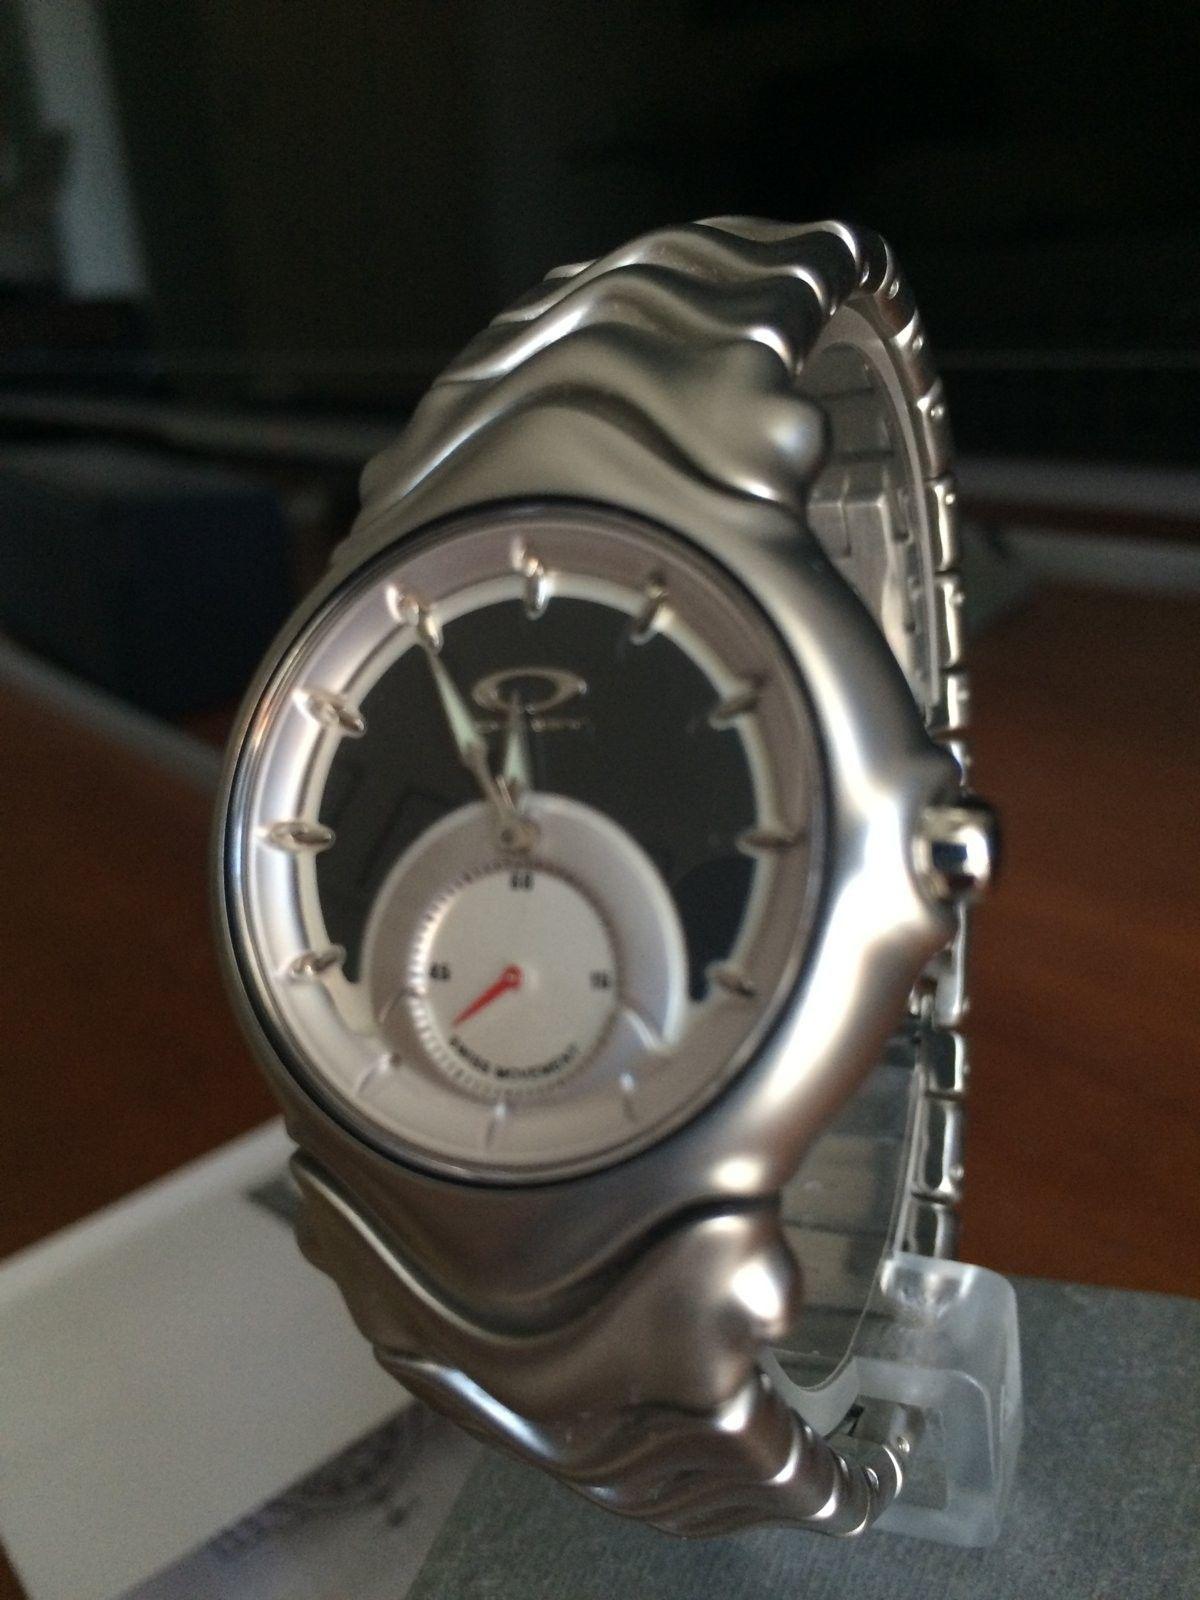 Oakley Jury Watch (BN) - Honed / Gunmetal (SKU 10-170) - IMG_2899.JPG